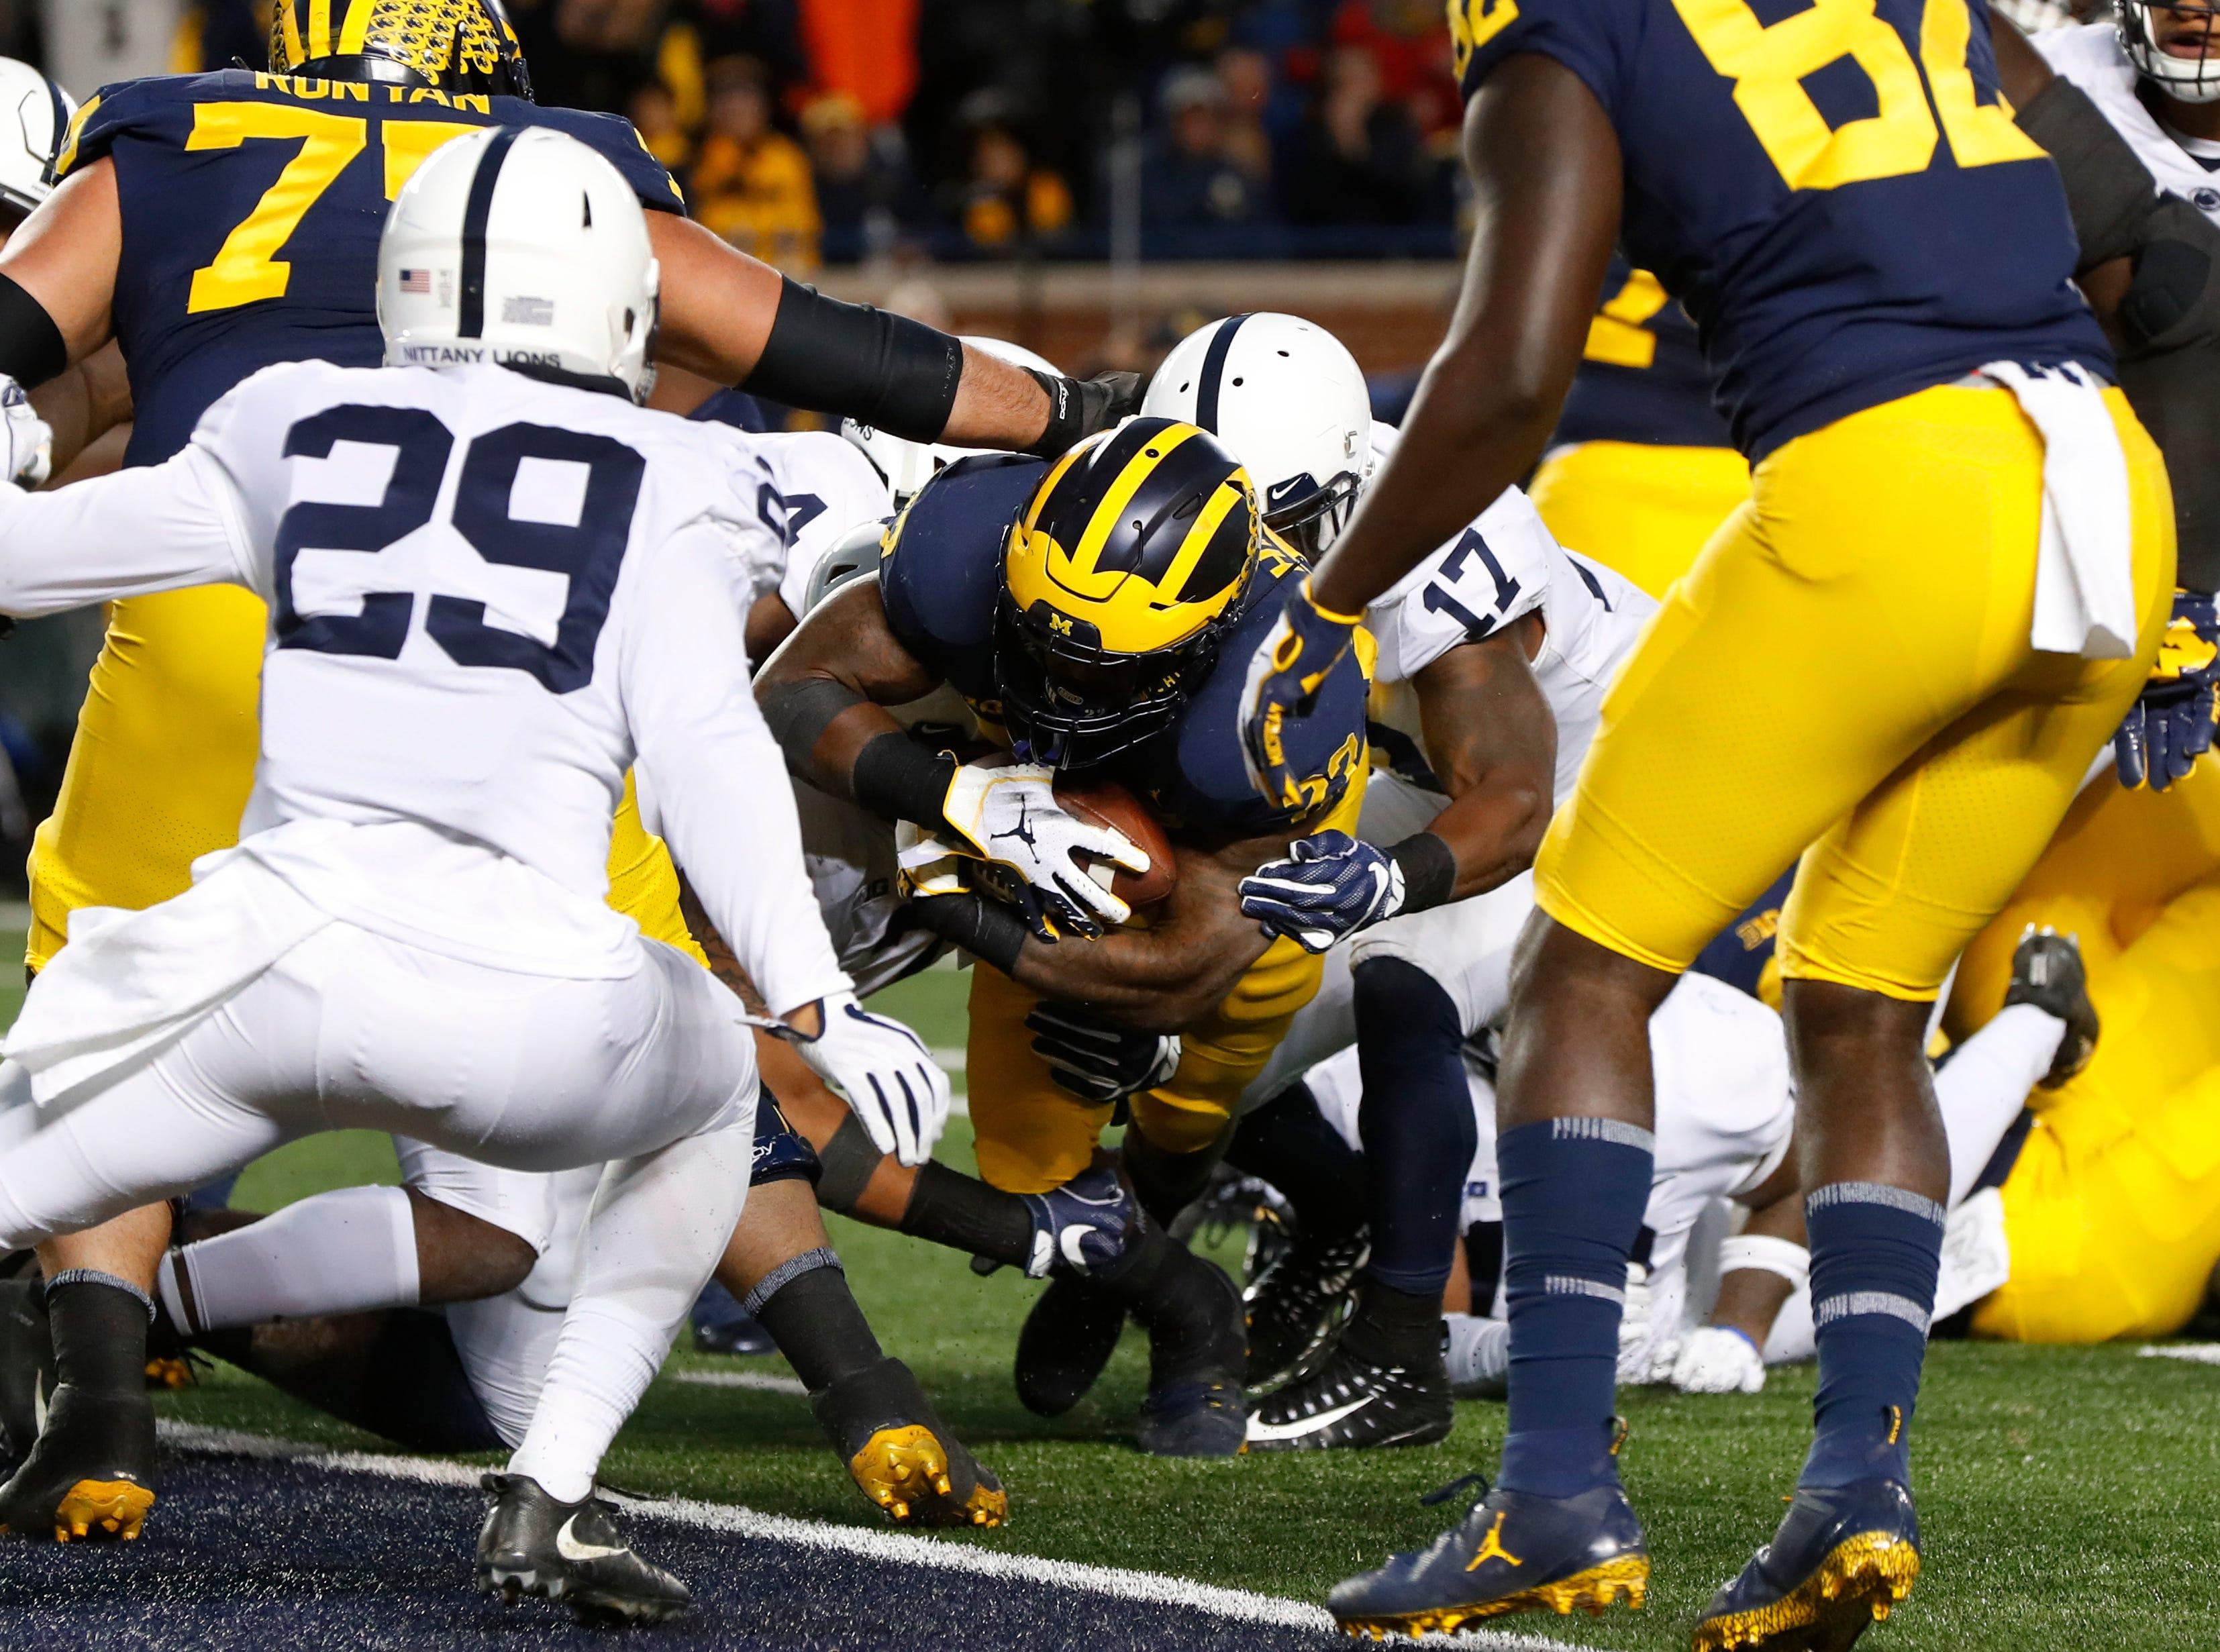 Michigan running back Karan Higdon (22)runs for a four-yard touchdown against Penn State in the second half of an NCAA college football game in Ann Arbor, Mich., Saturday, Nov. 3, 2018. (AP Photo/Paul Sancya)